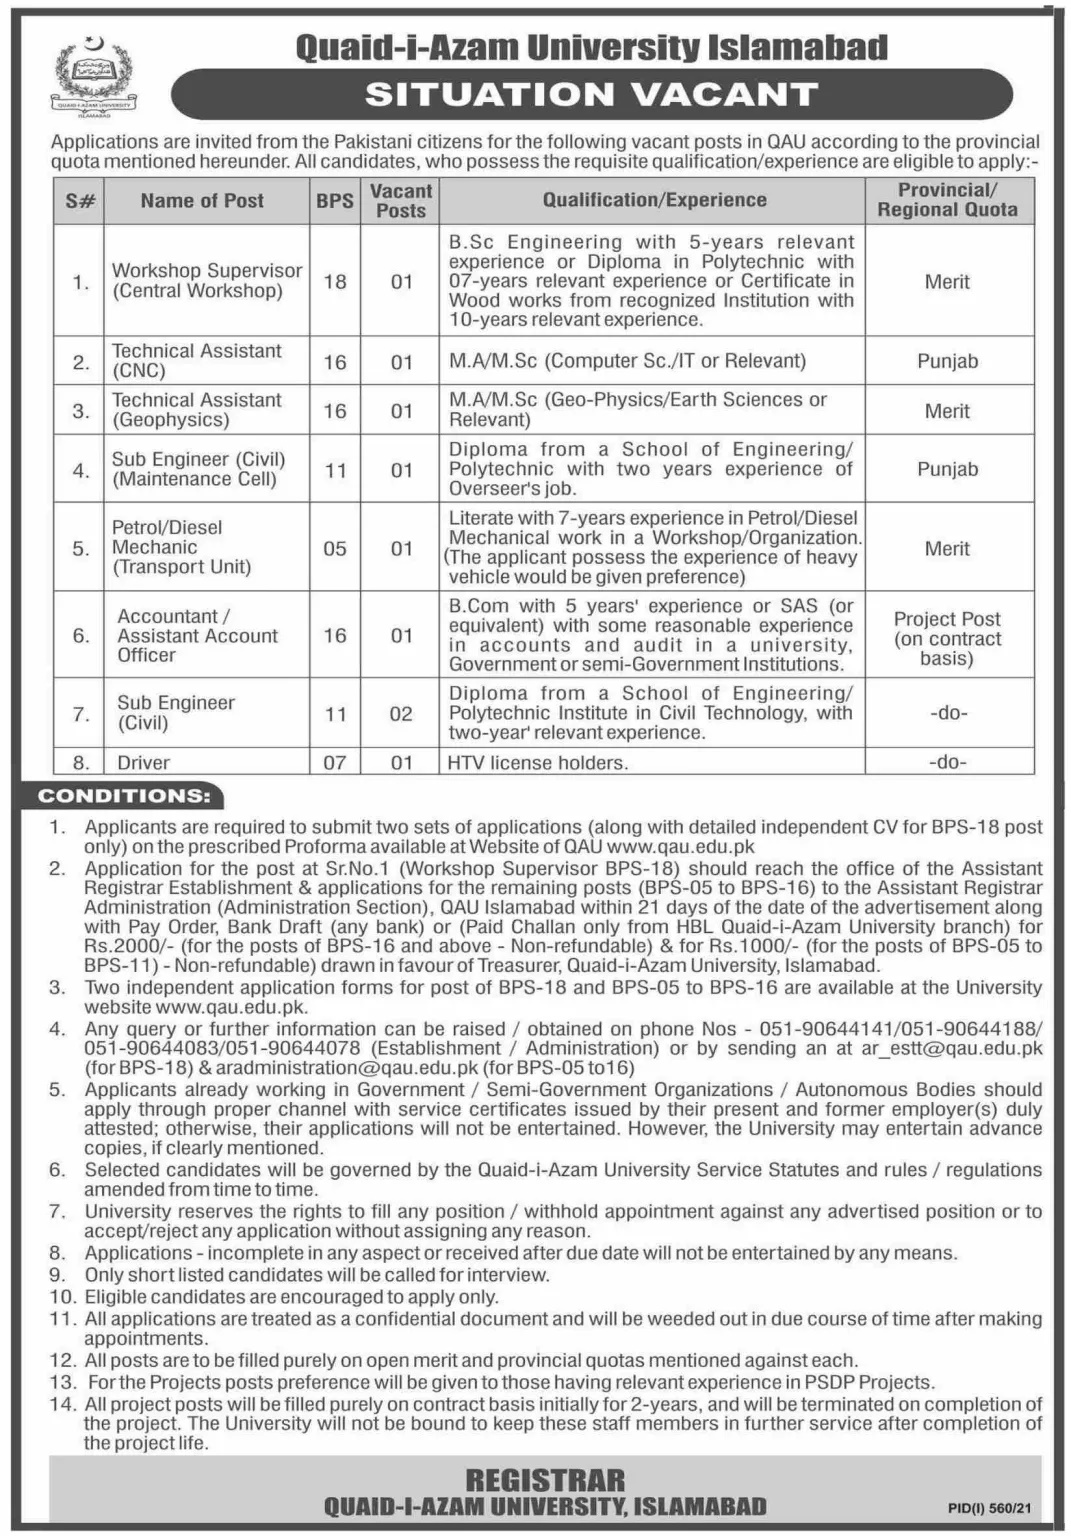 Islamabad Quaid-e-Azam University Jobs 2021 Last Date for Applying